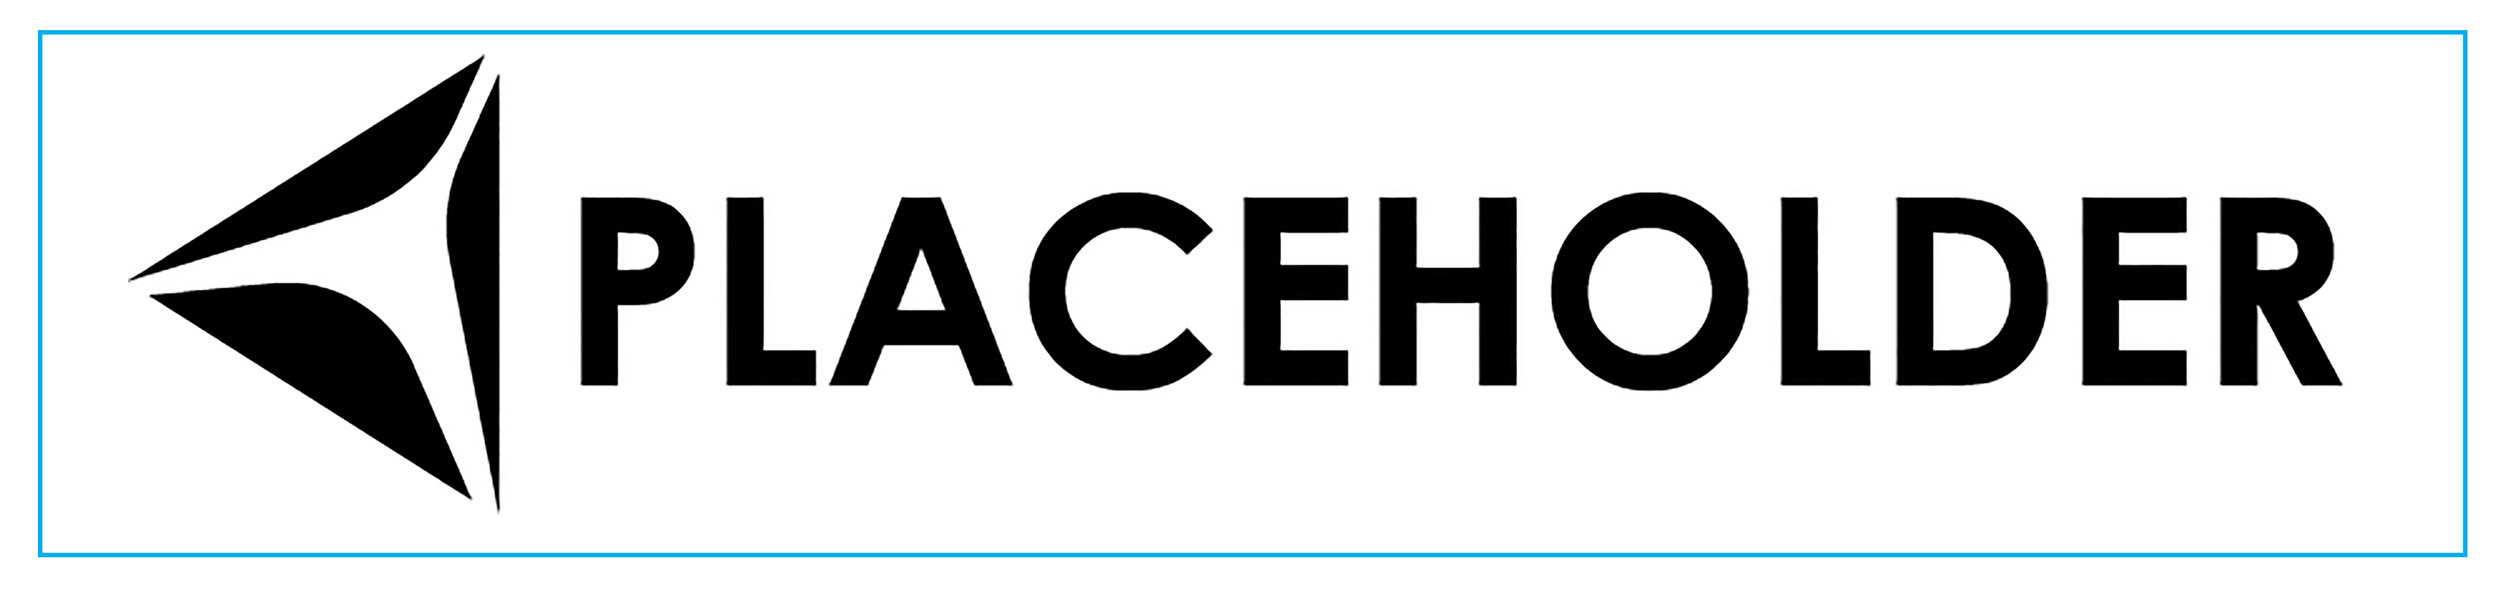 placeholder.com-logo11.jpg